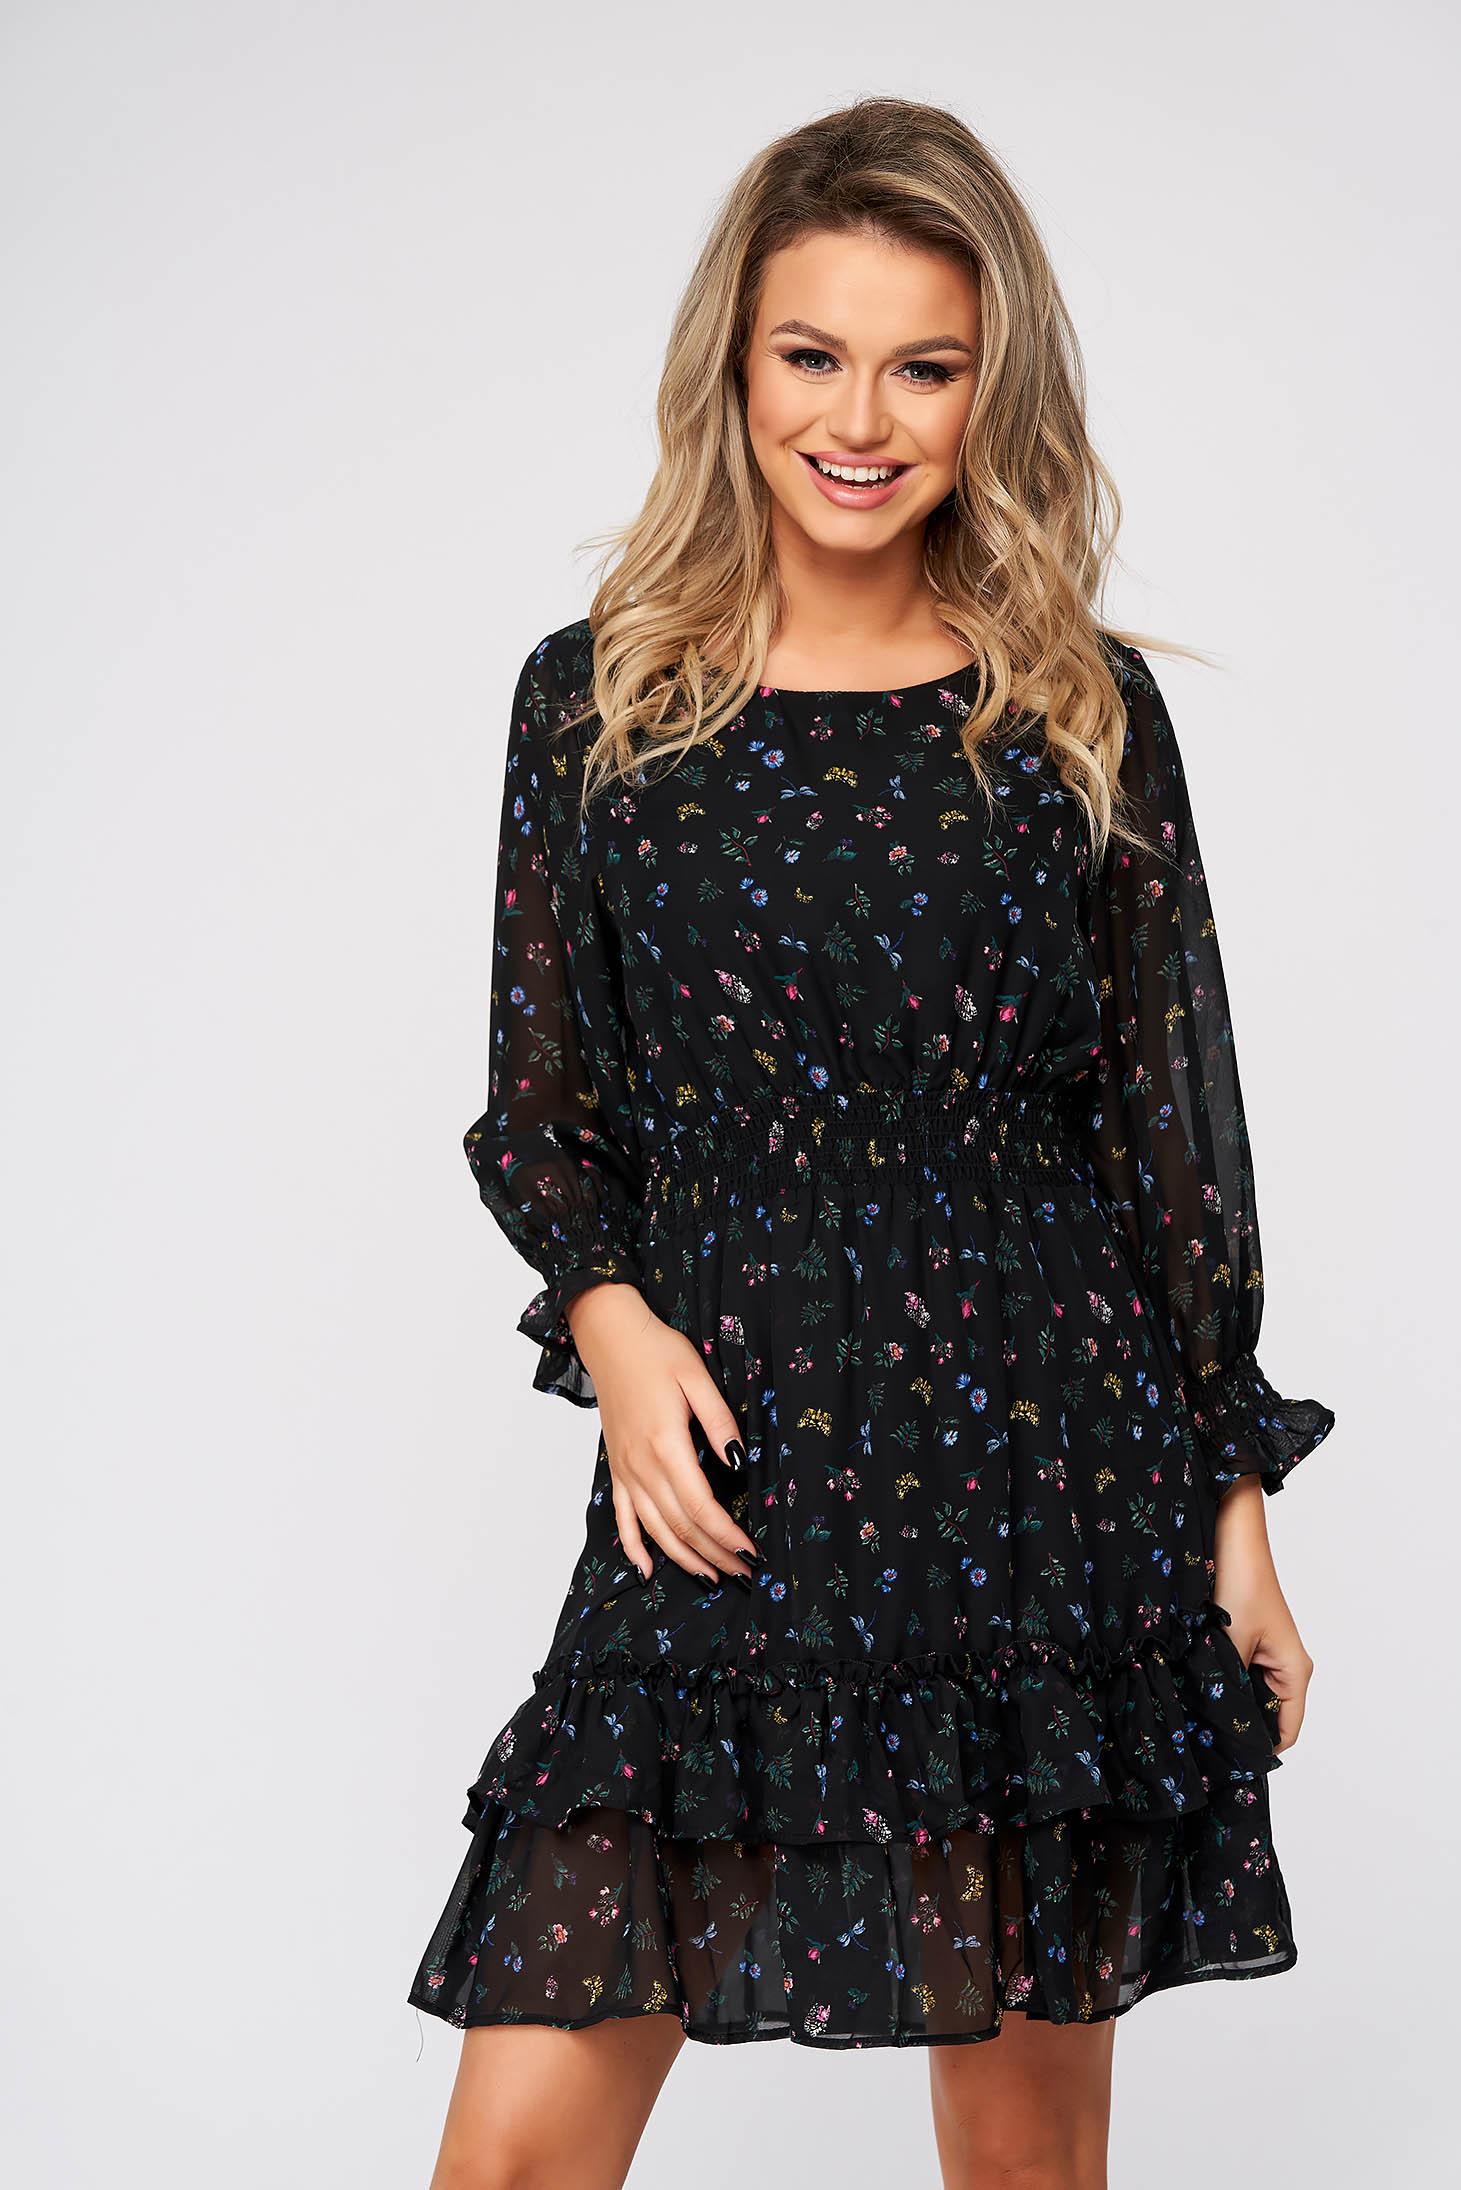 Black dress midi daily from veil fabric cloche with elastic waist